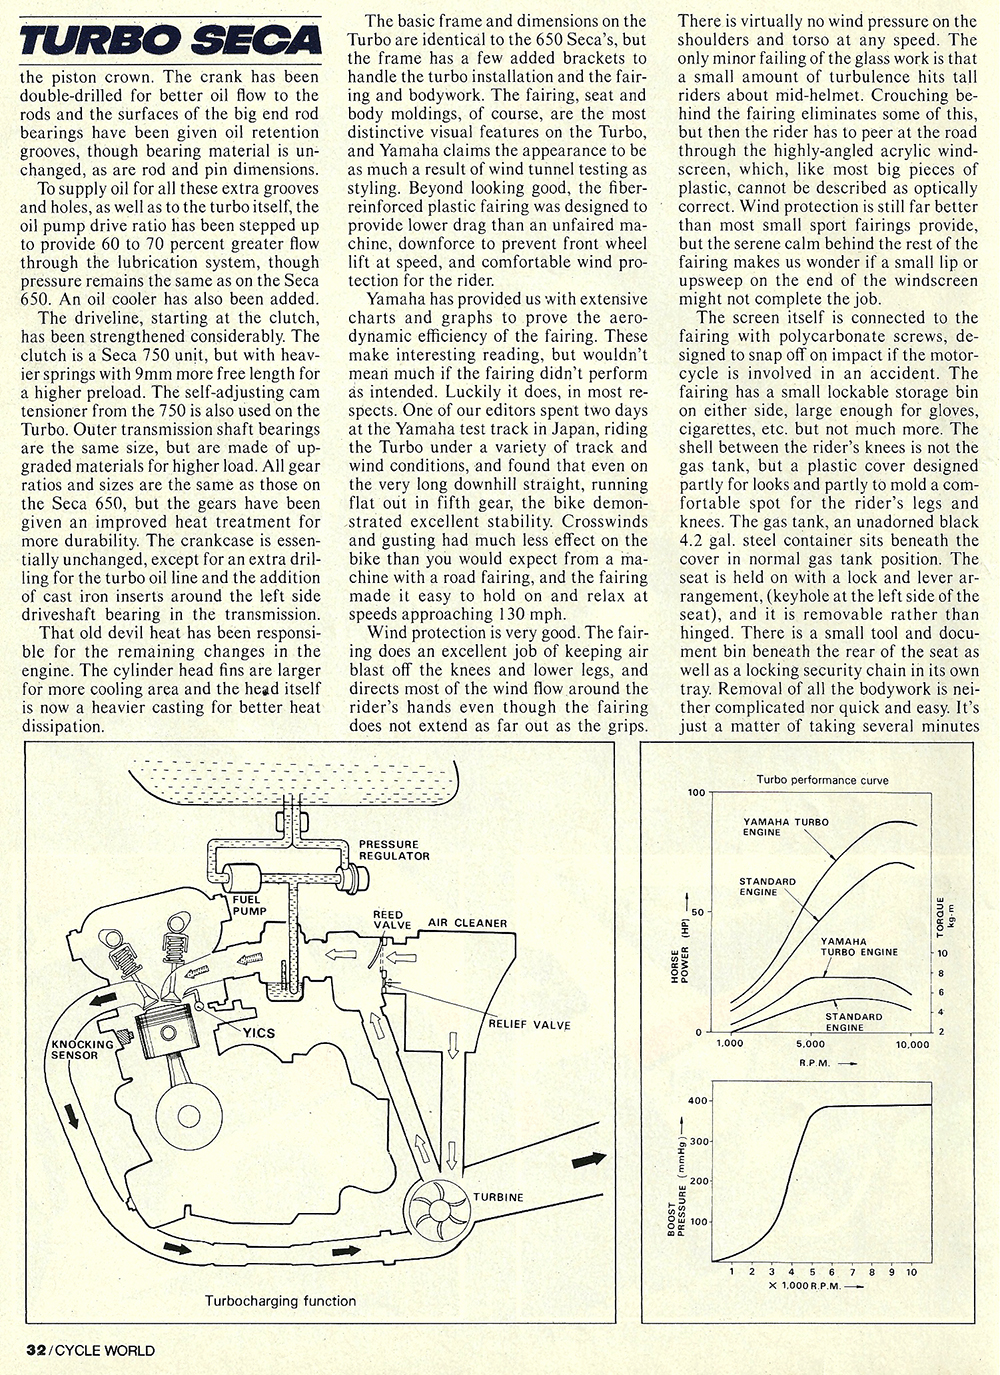 1982 Yamaha Turbo Seca 650 road test 05.jpg